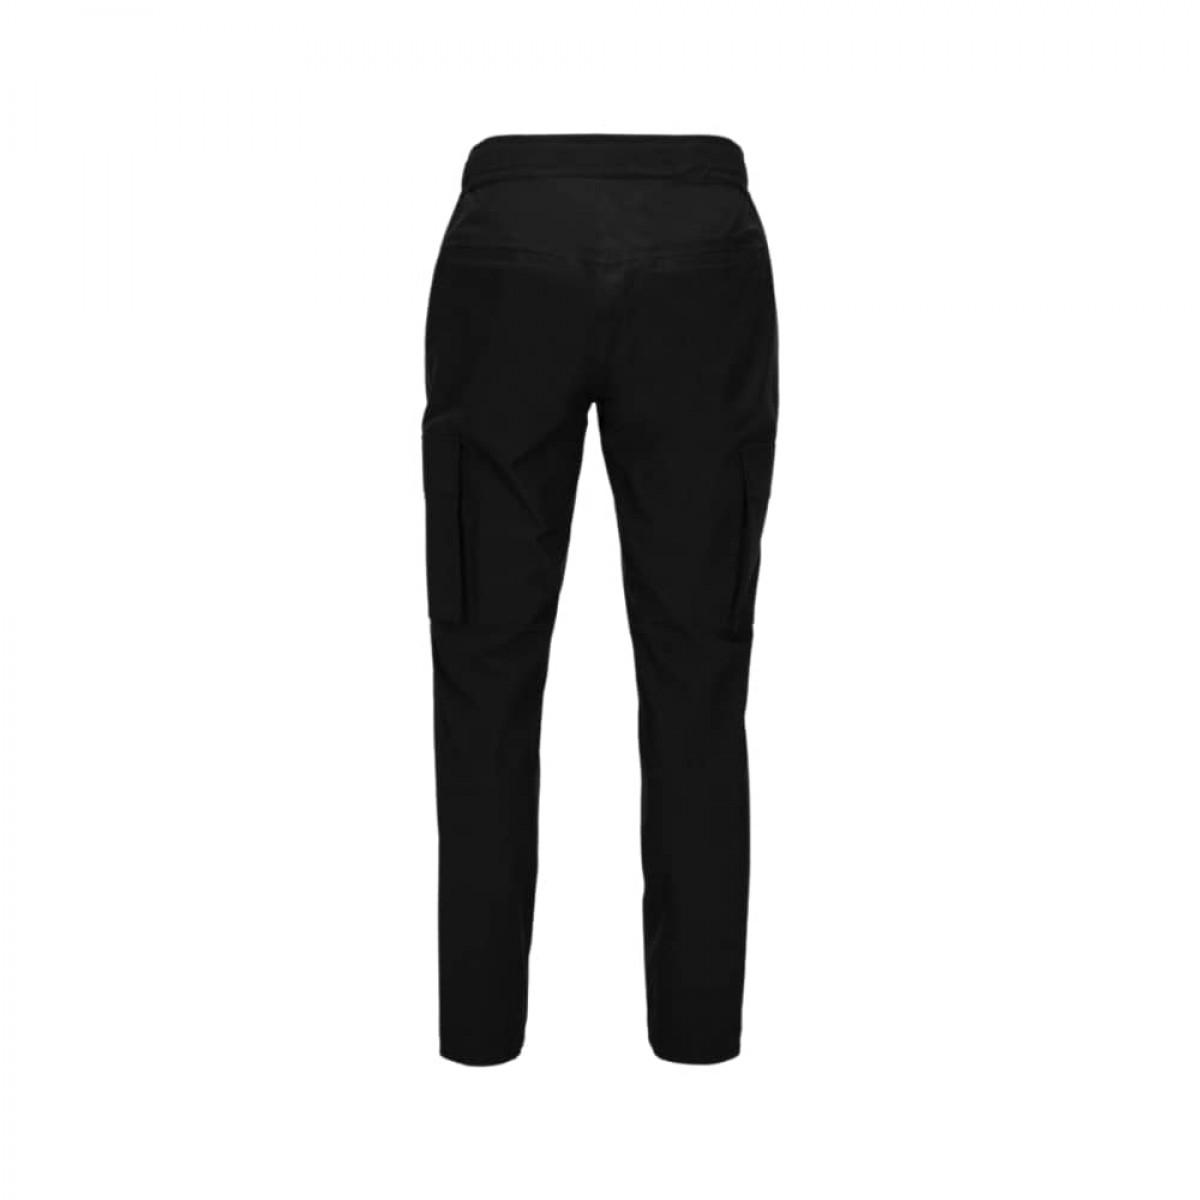 giske pants - black - bagfra